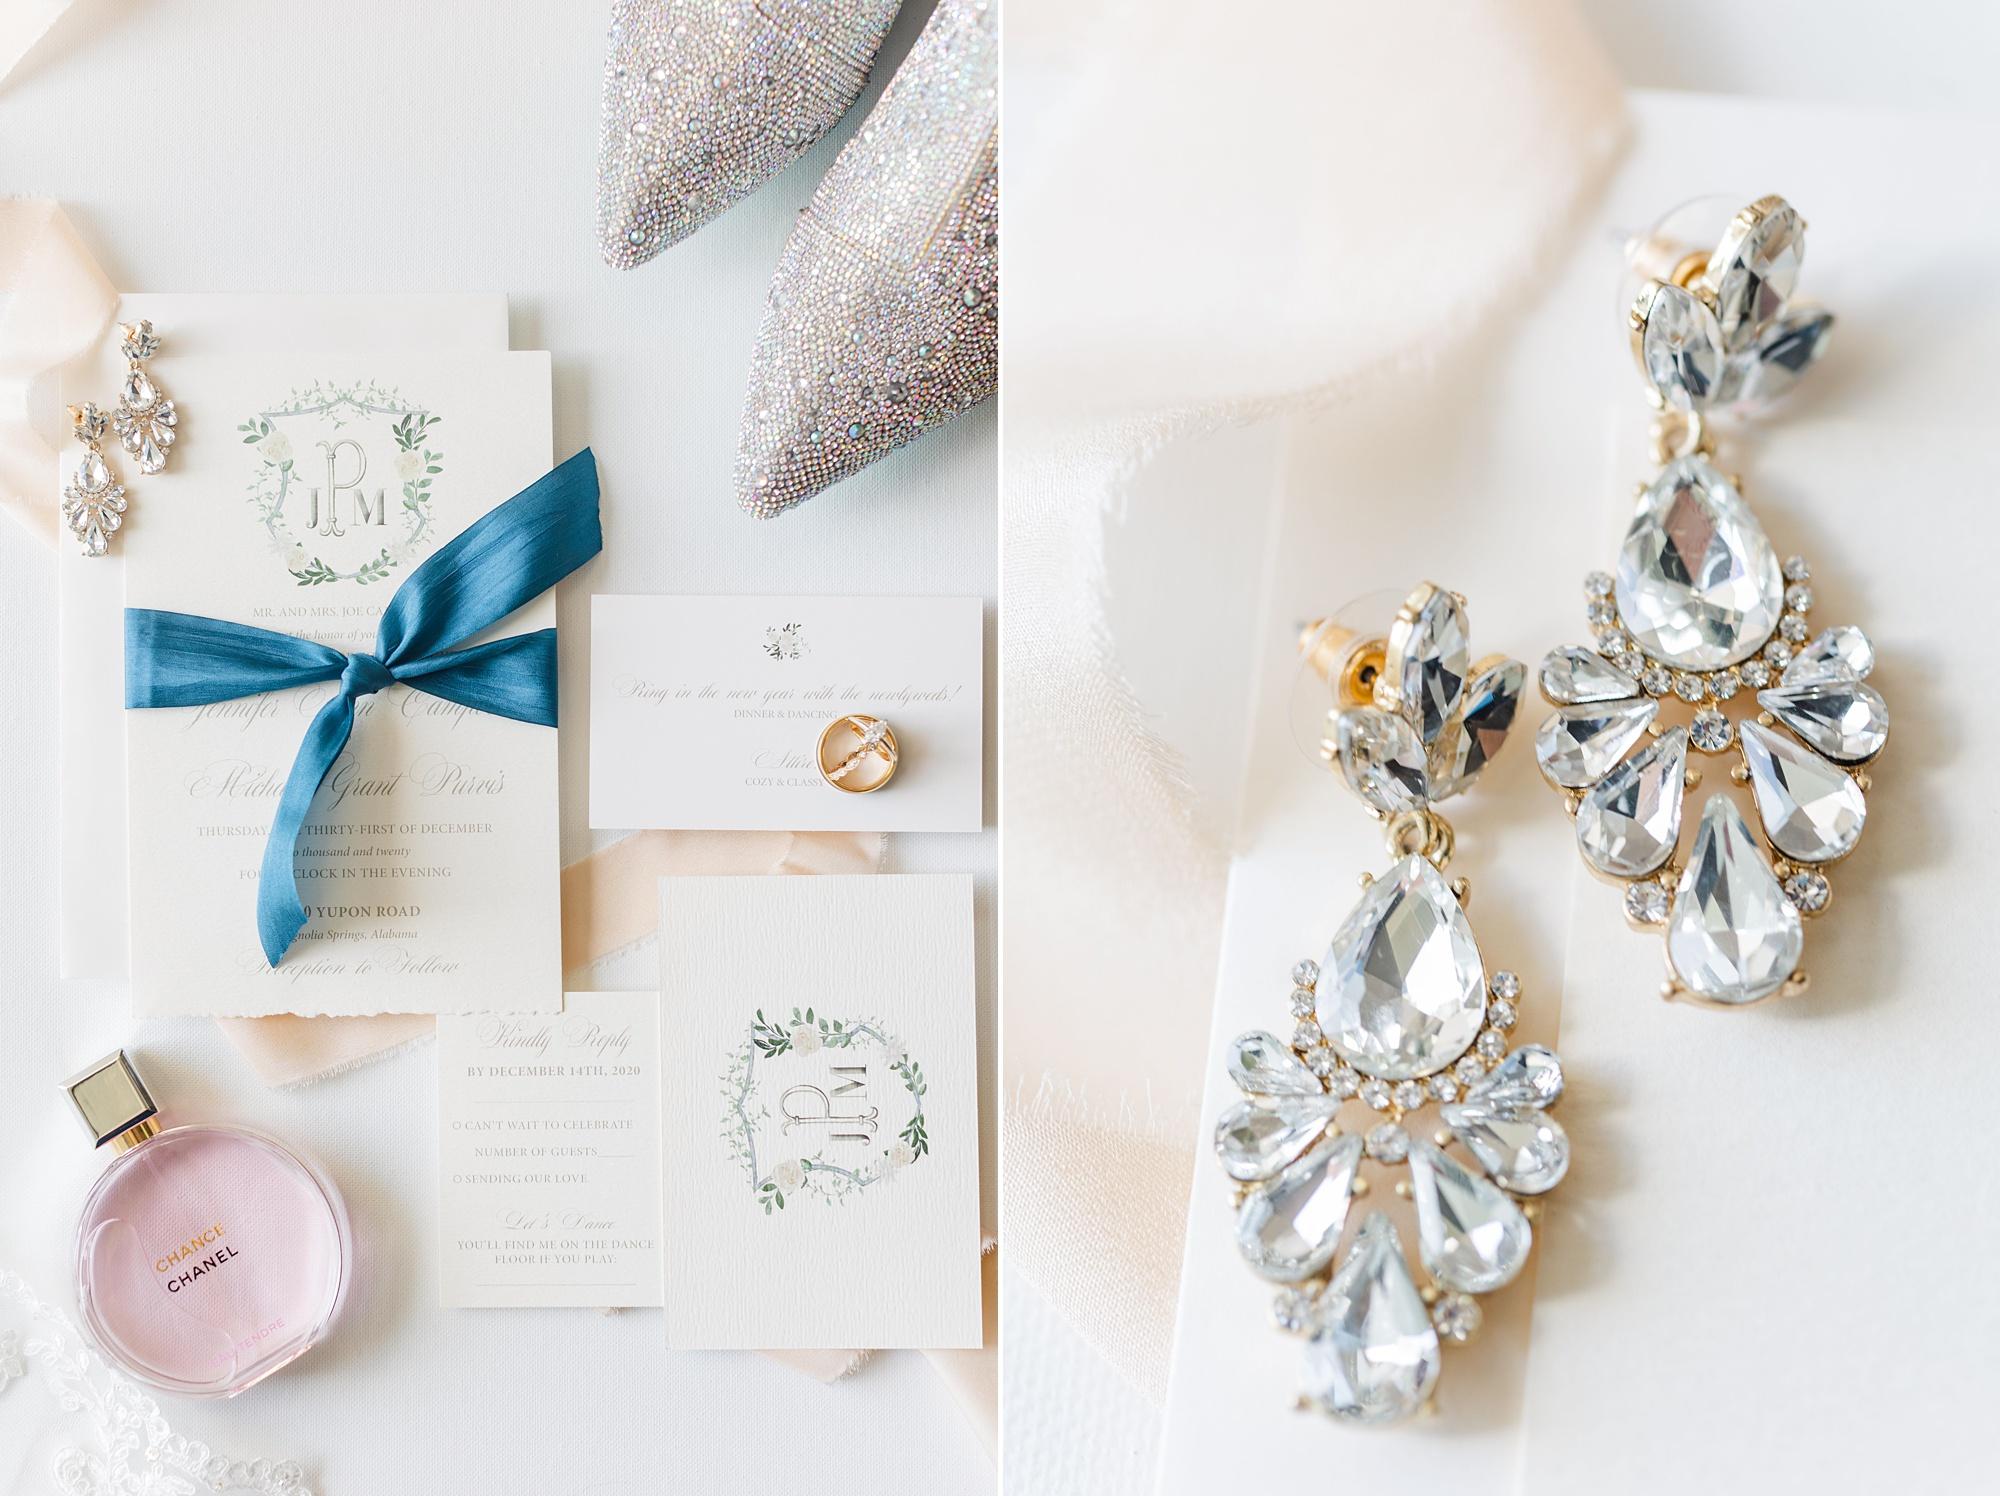 elegant invitation suite for New Year's Eve wedding